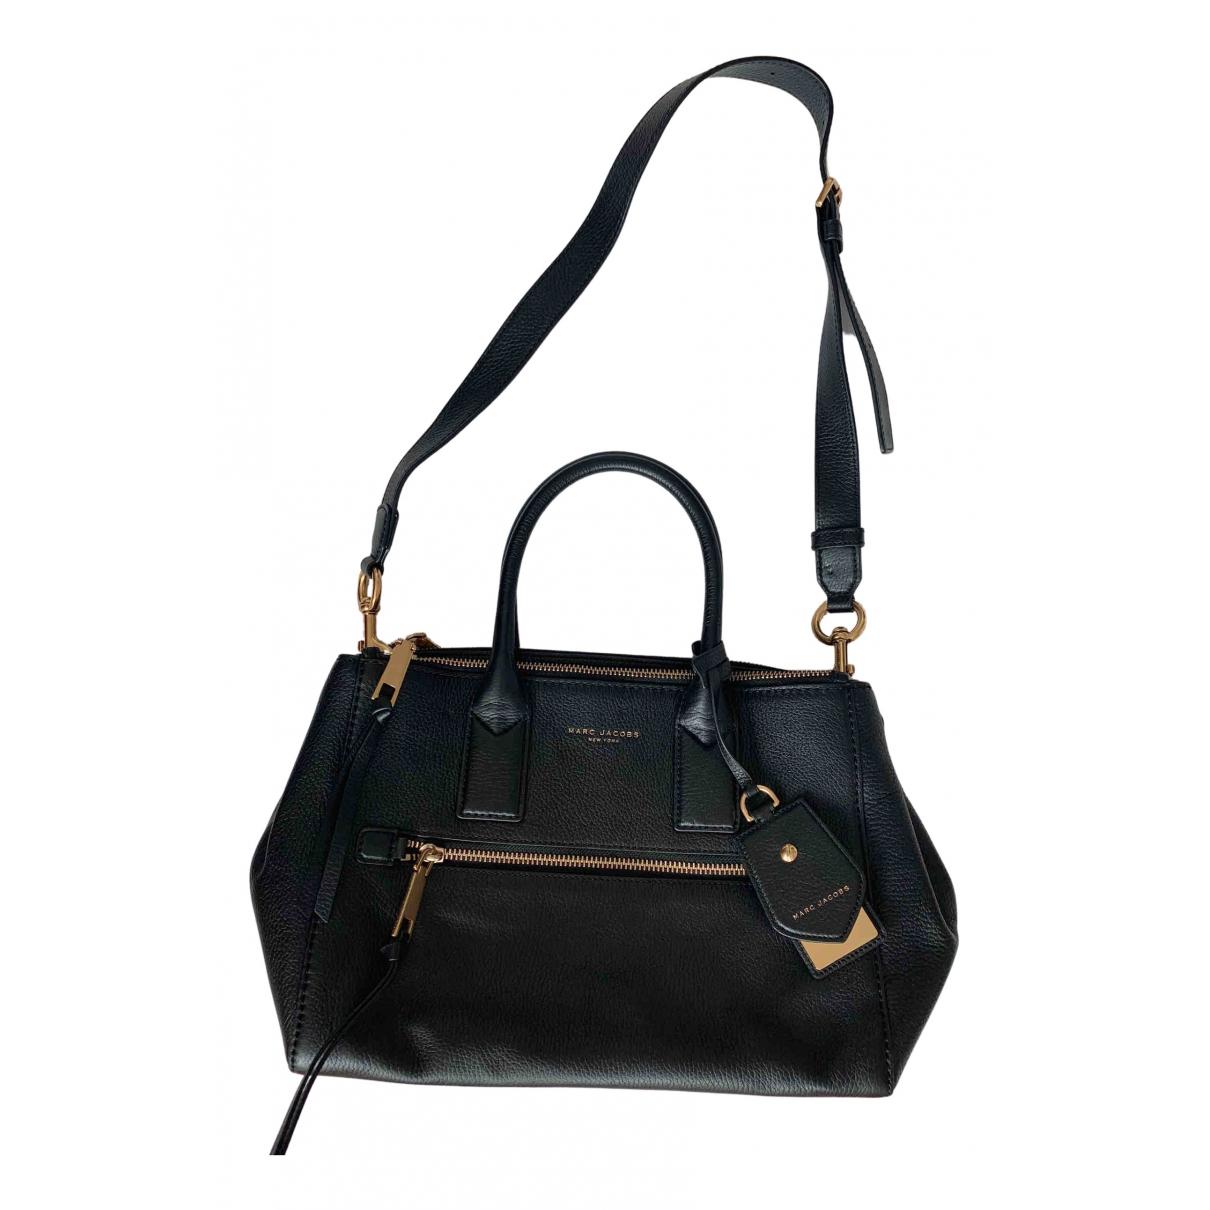 Marc Jacobs \N Handtasche in  Schwarz Leder